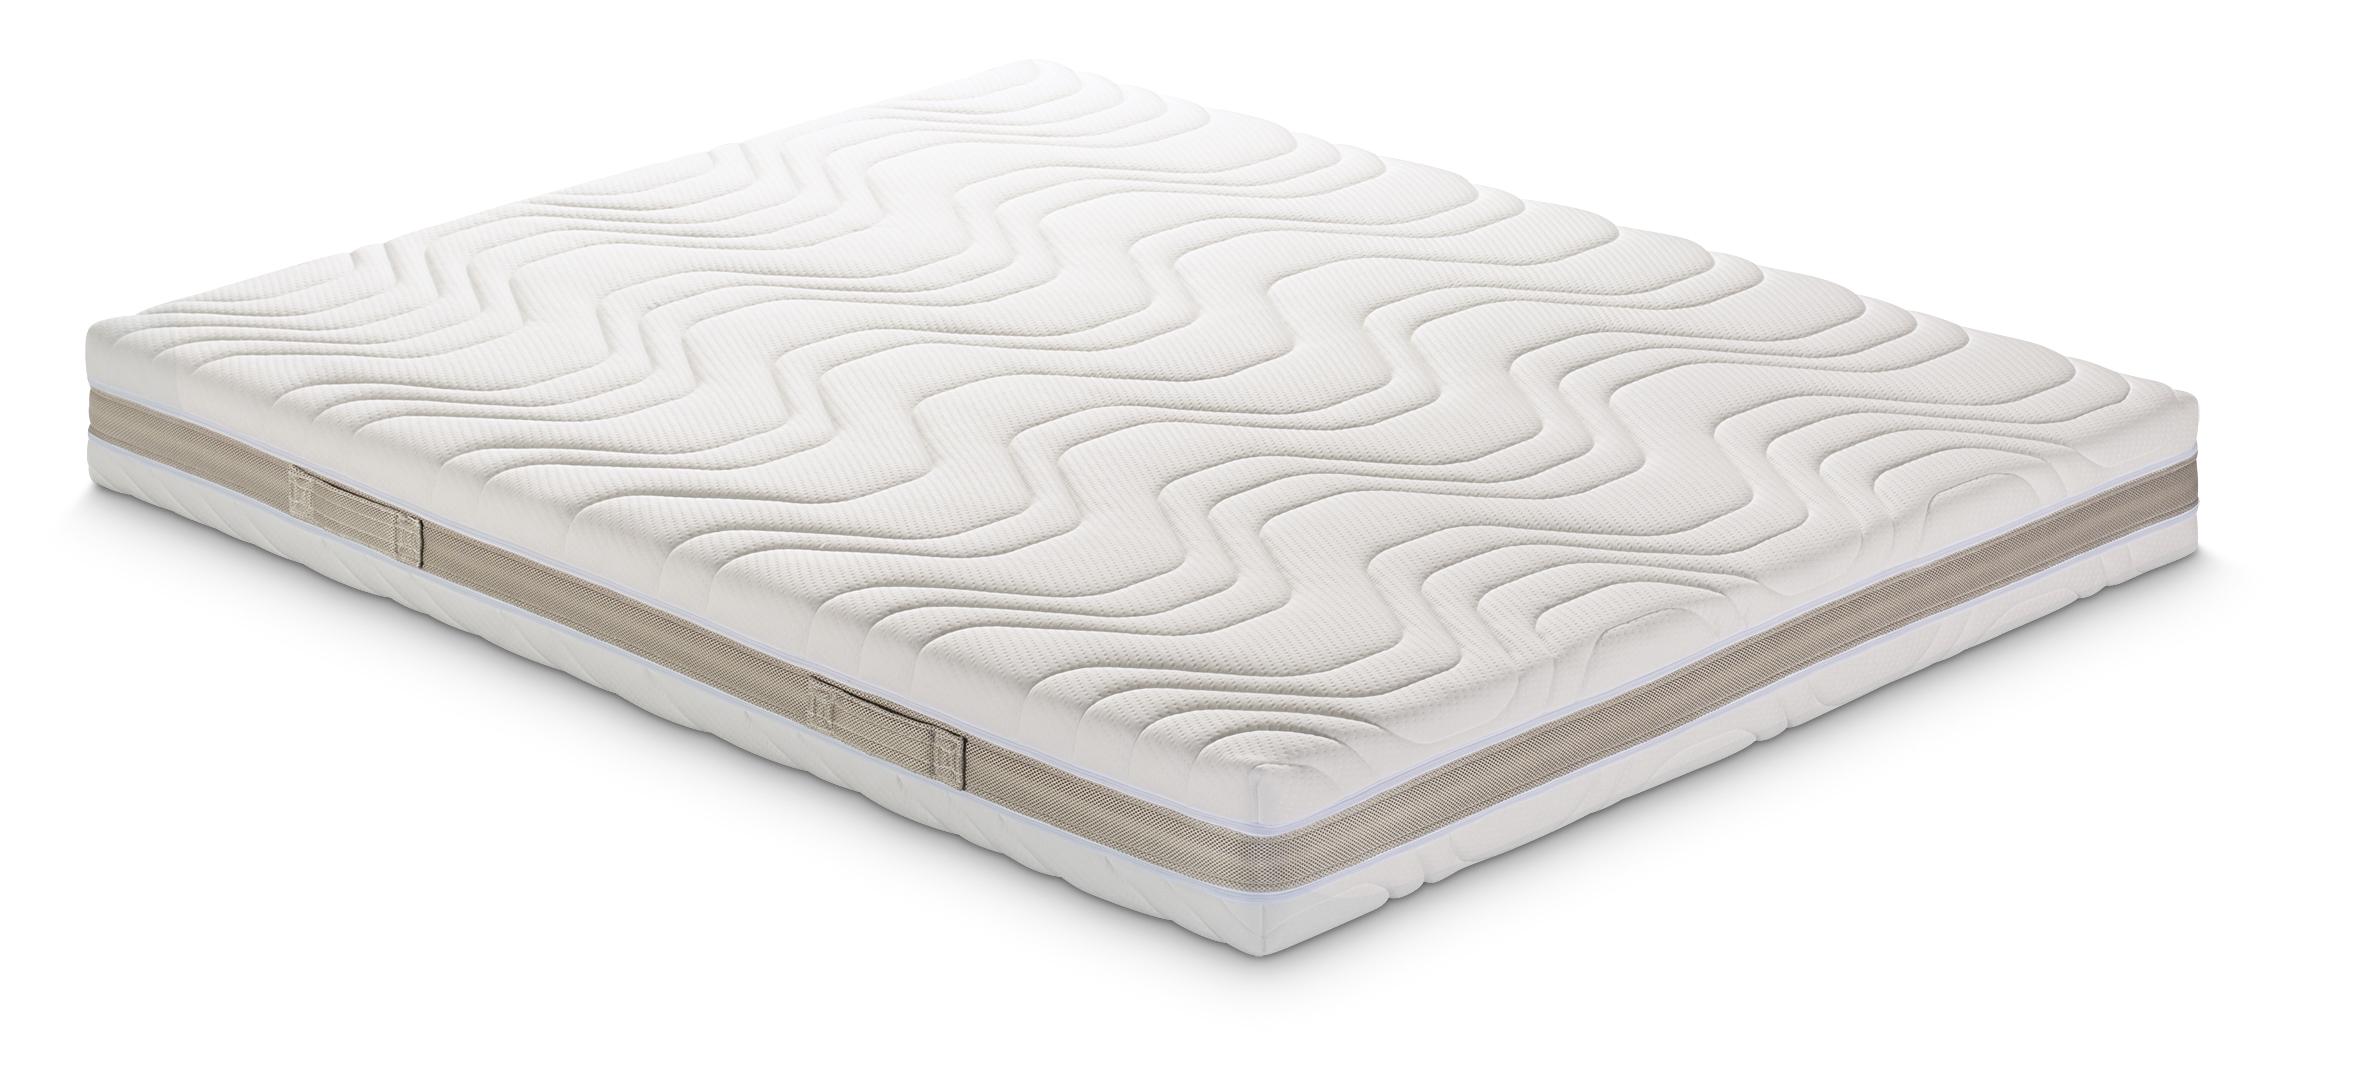 materasso bedding - 28 images - materasso bedding energika soft ...